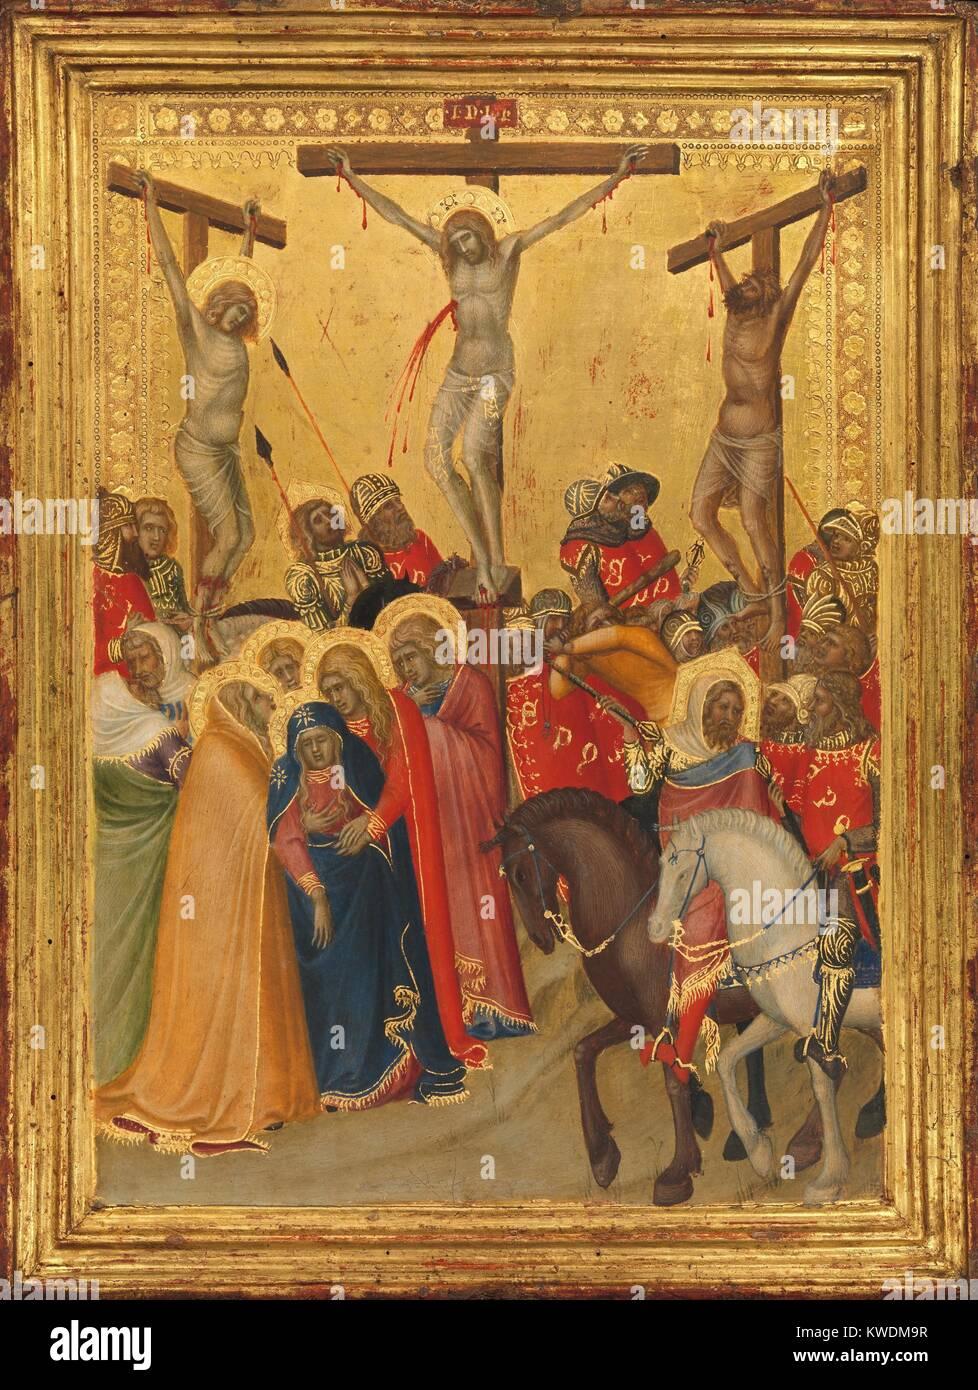 THE CRUCIFIXION, by Pietro Lorenzetti, 1340s, Italian Renaissance painting, tempera, oil on wood. Lorenzetti added - Stock Image